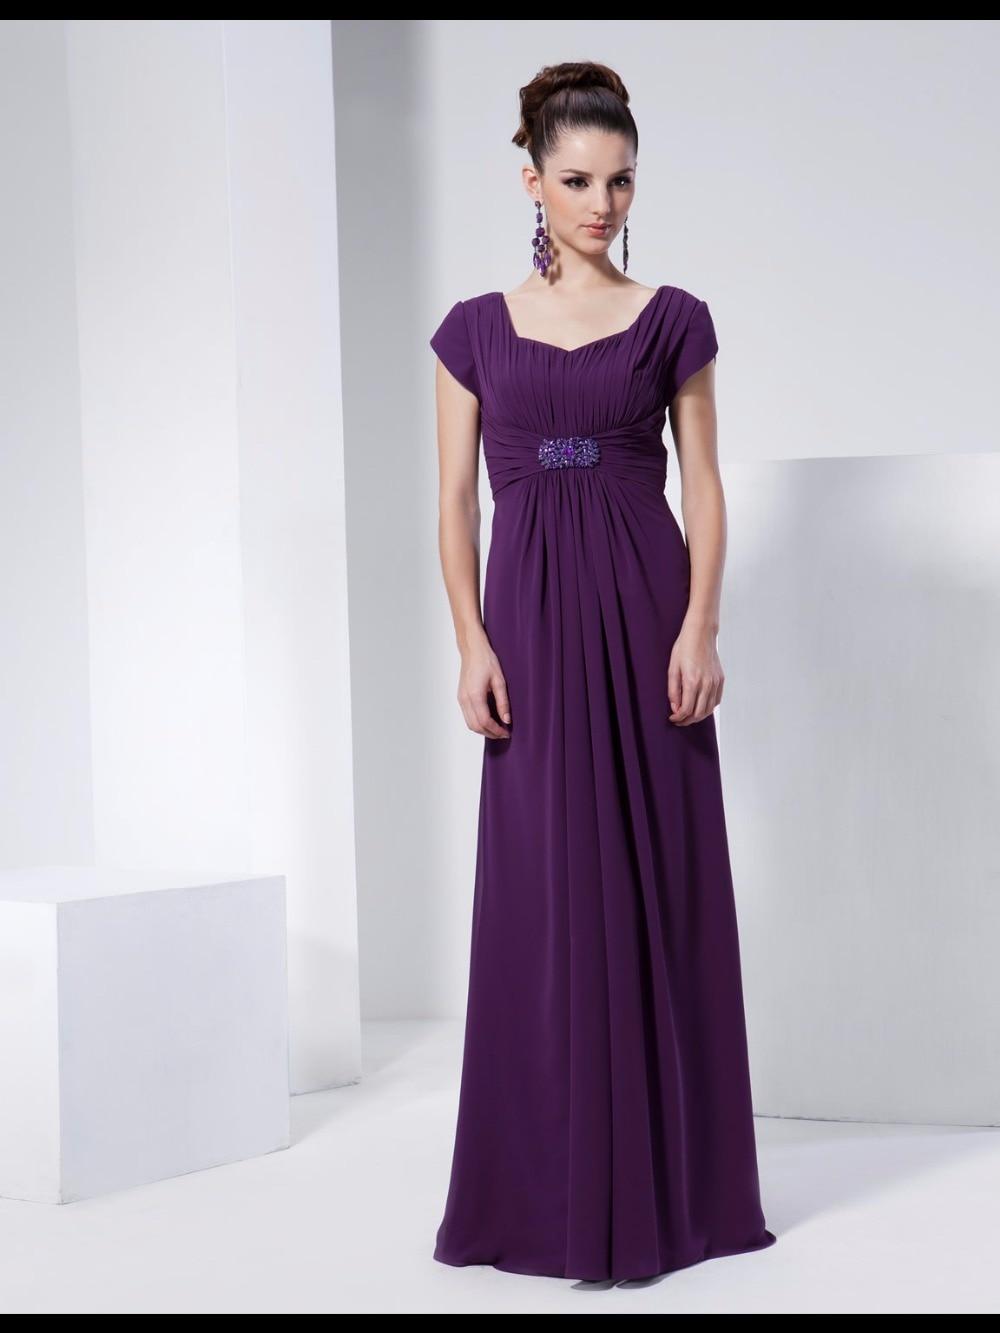 Cap-sleeved A-line Long Chiffon Dress with Pleats